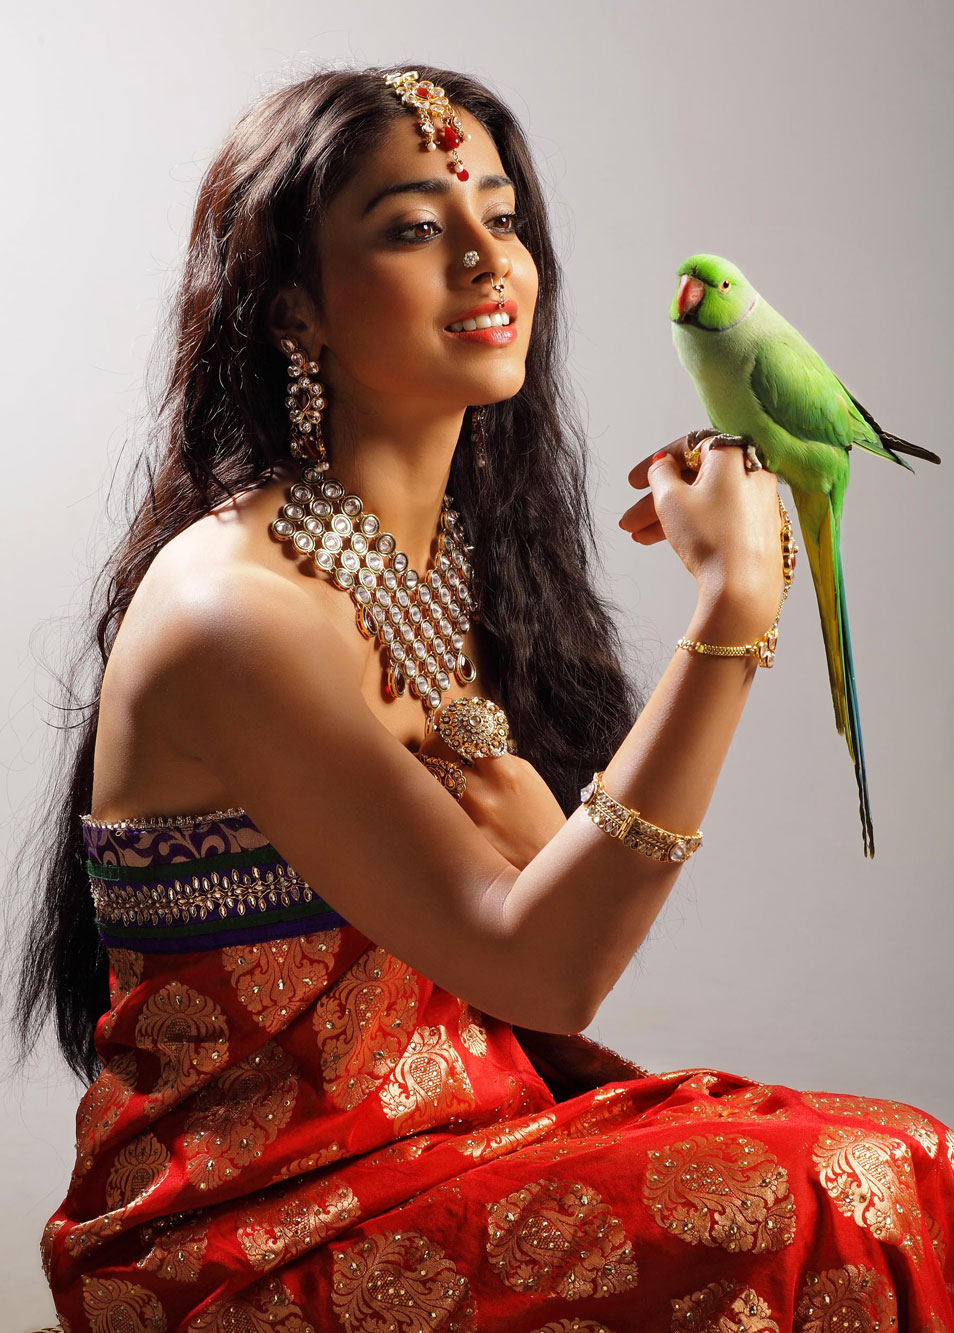 Way2Actressin Shriya In Sexy Saree Hot Looks Photo Gallery-8470